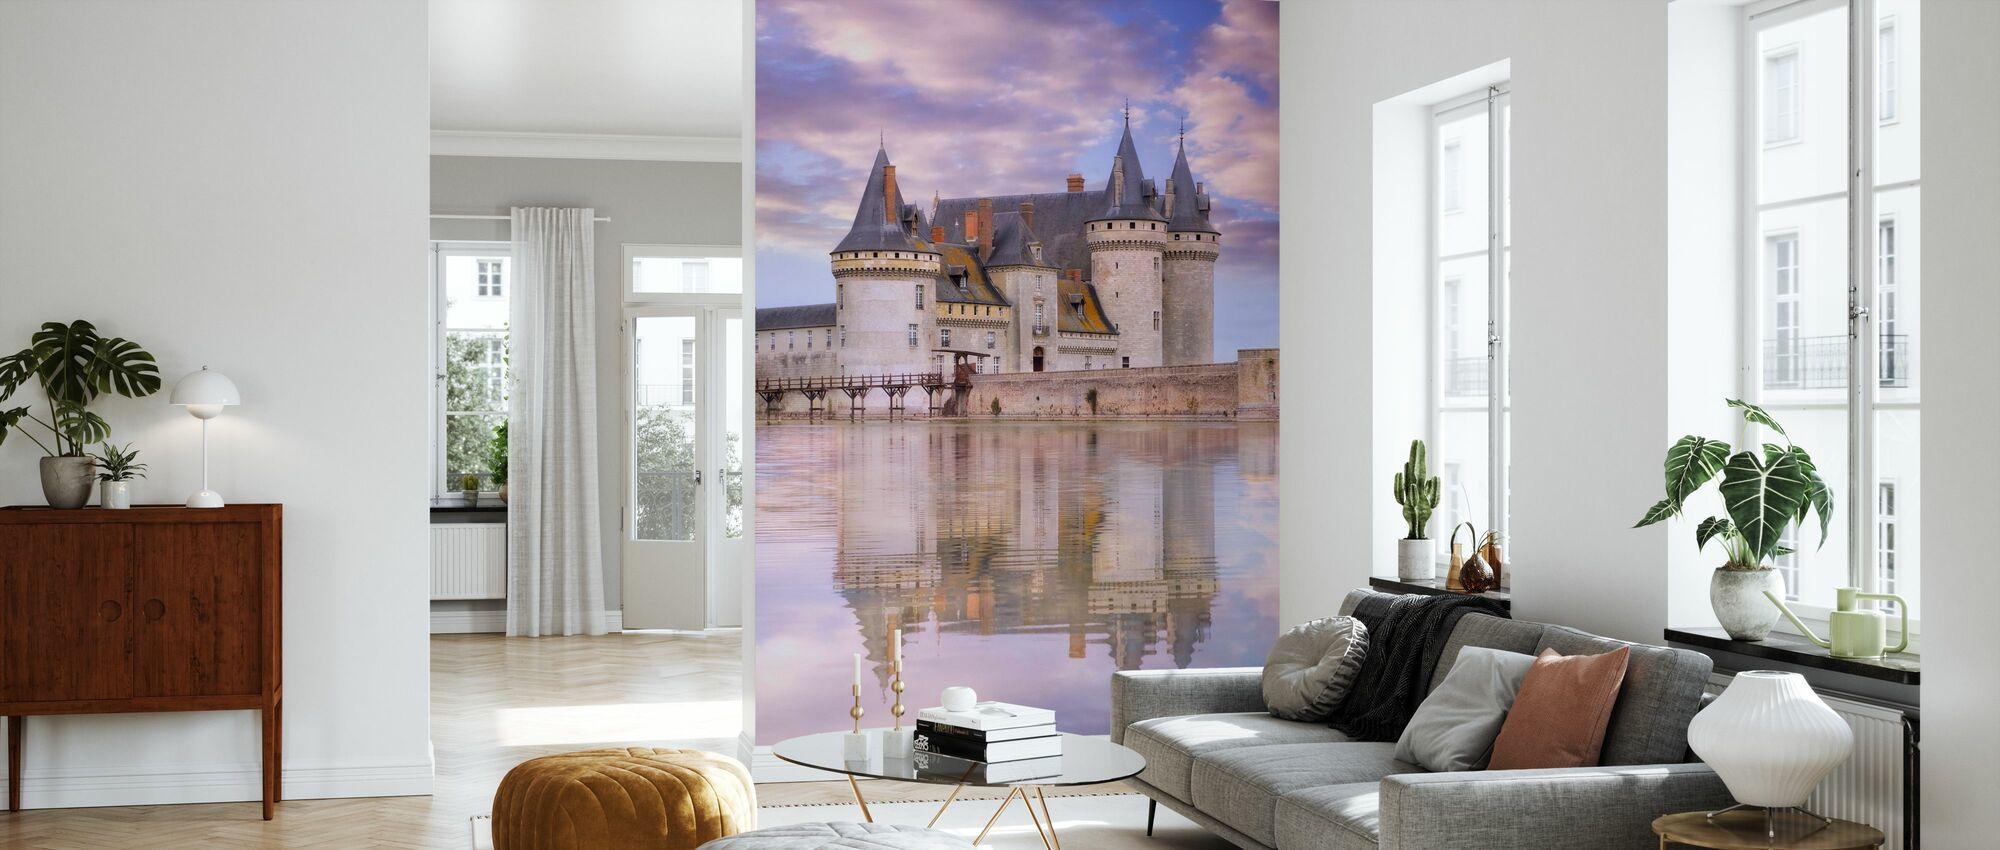 Castle at Sunset - Wallpaper - Living Room